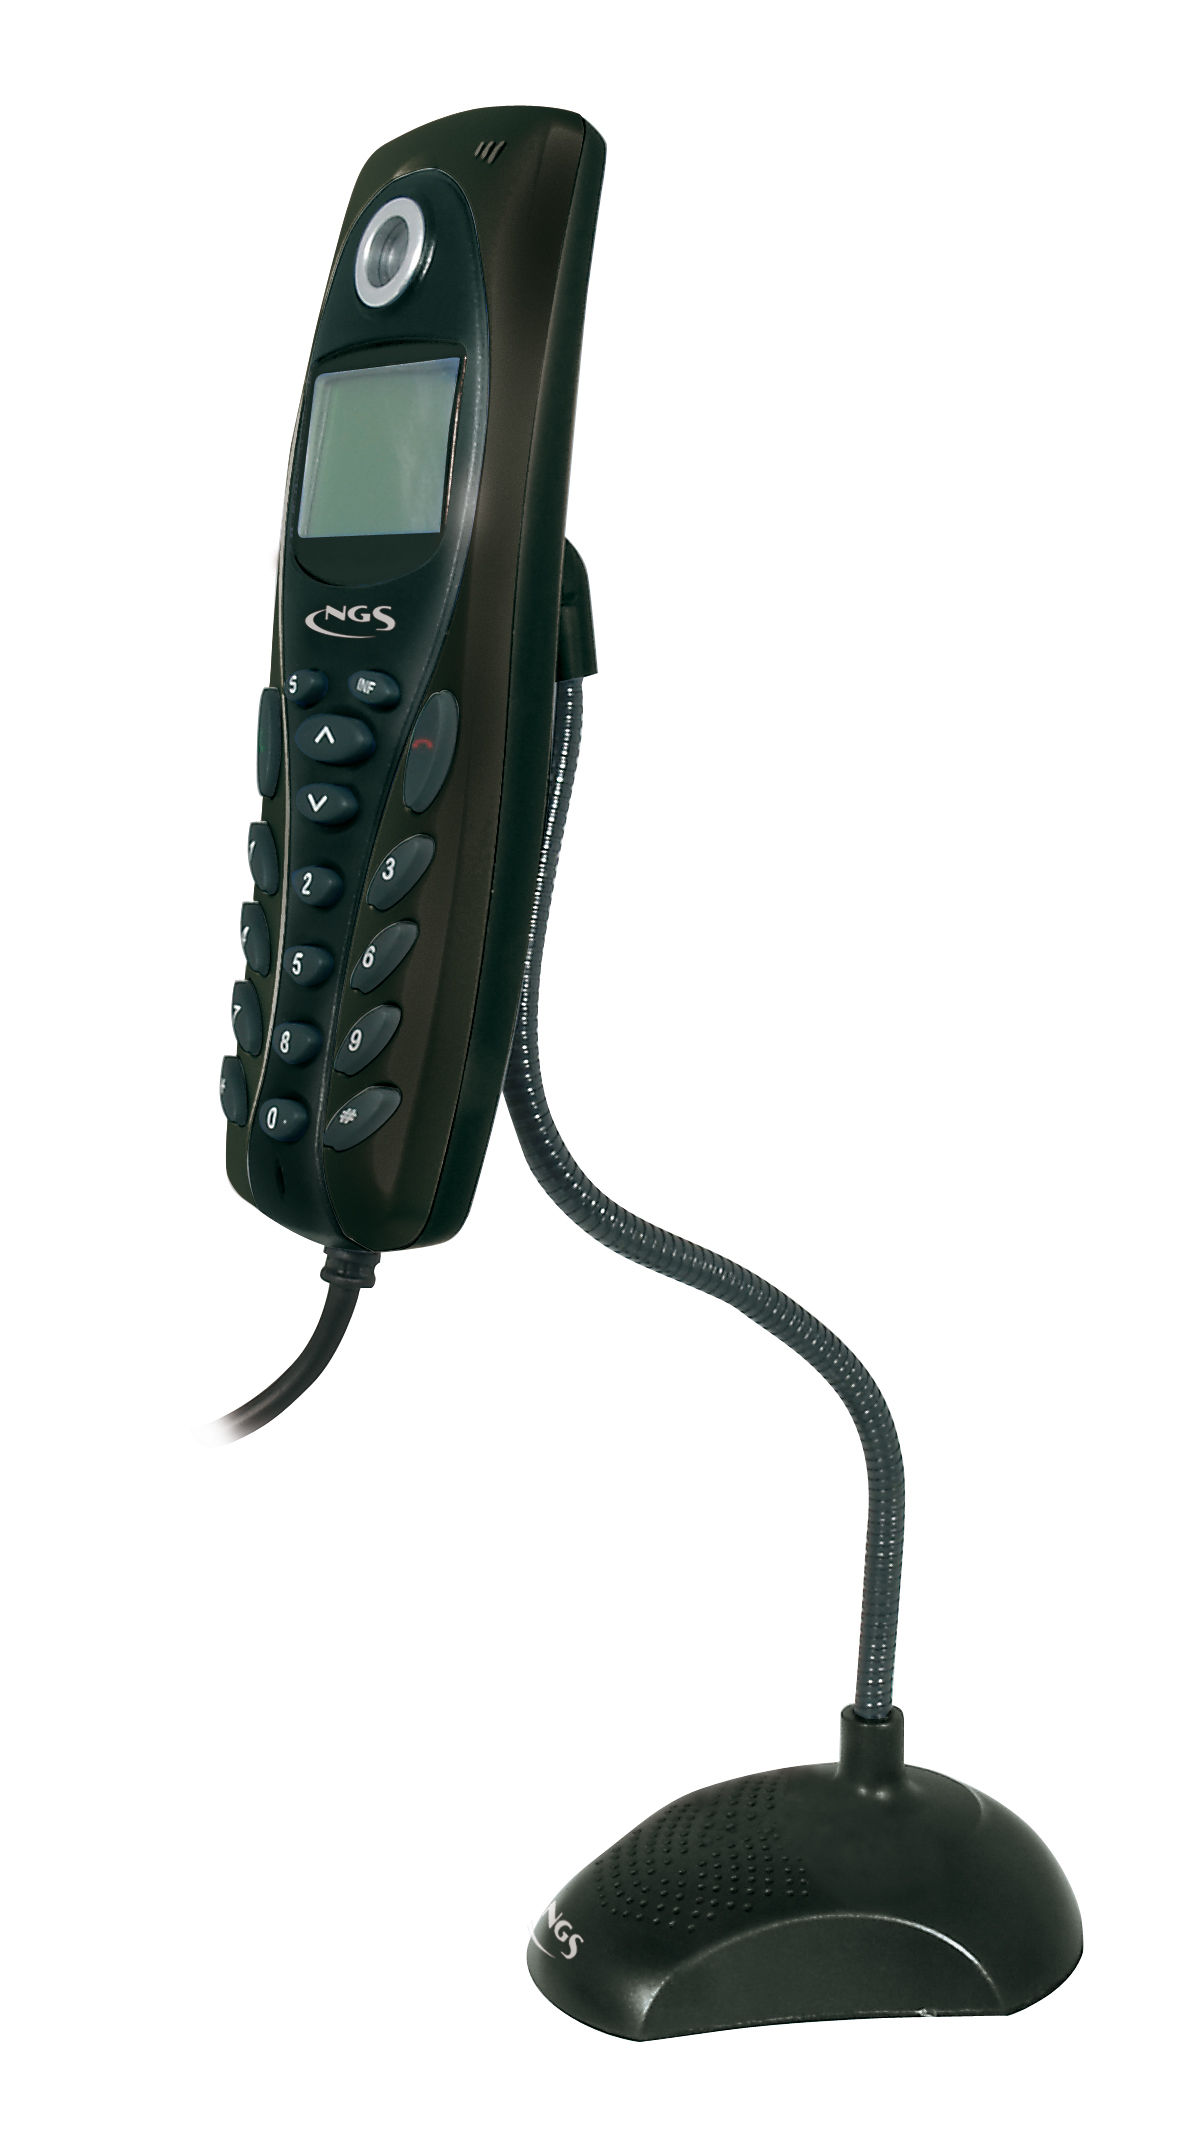 hablar por telefono con la pc: